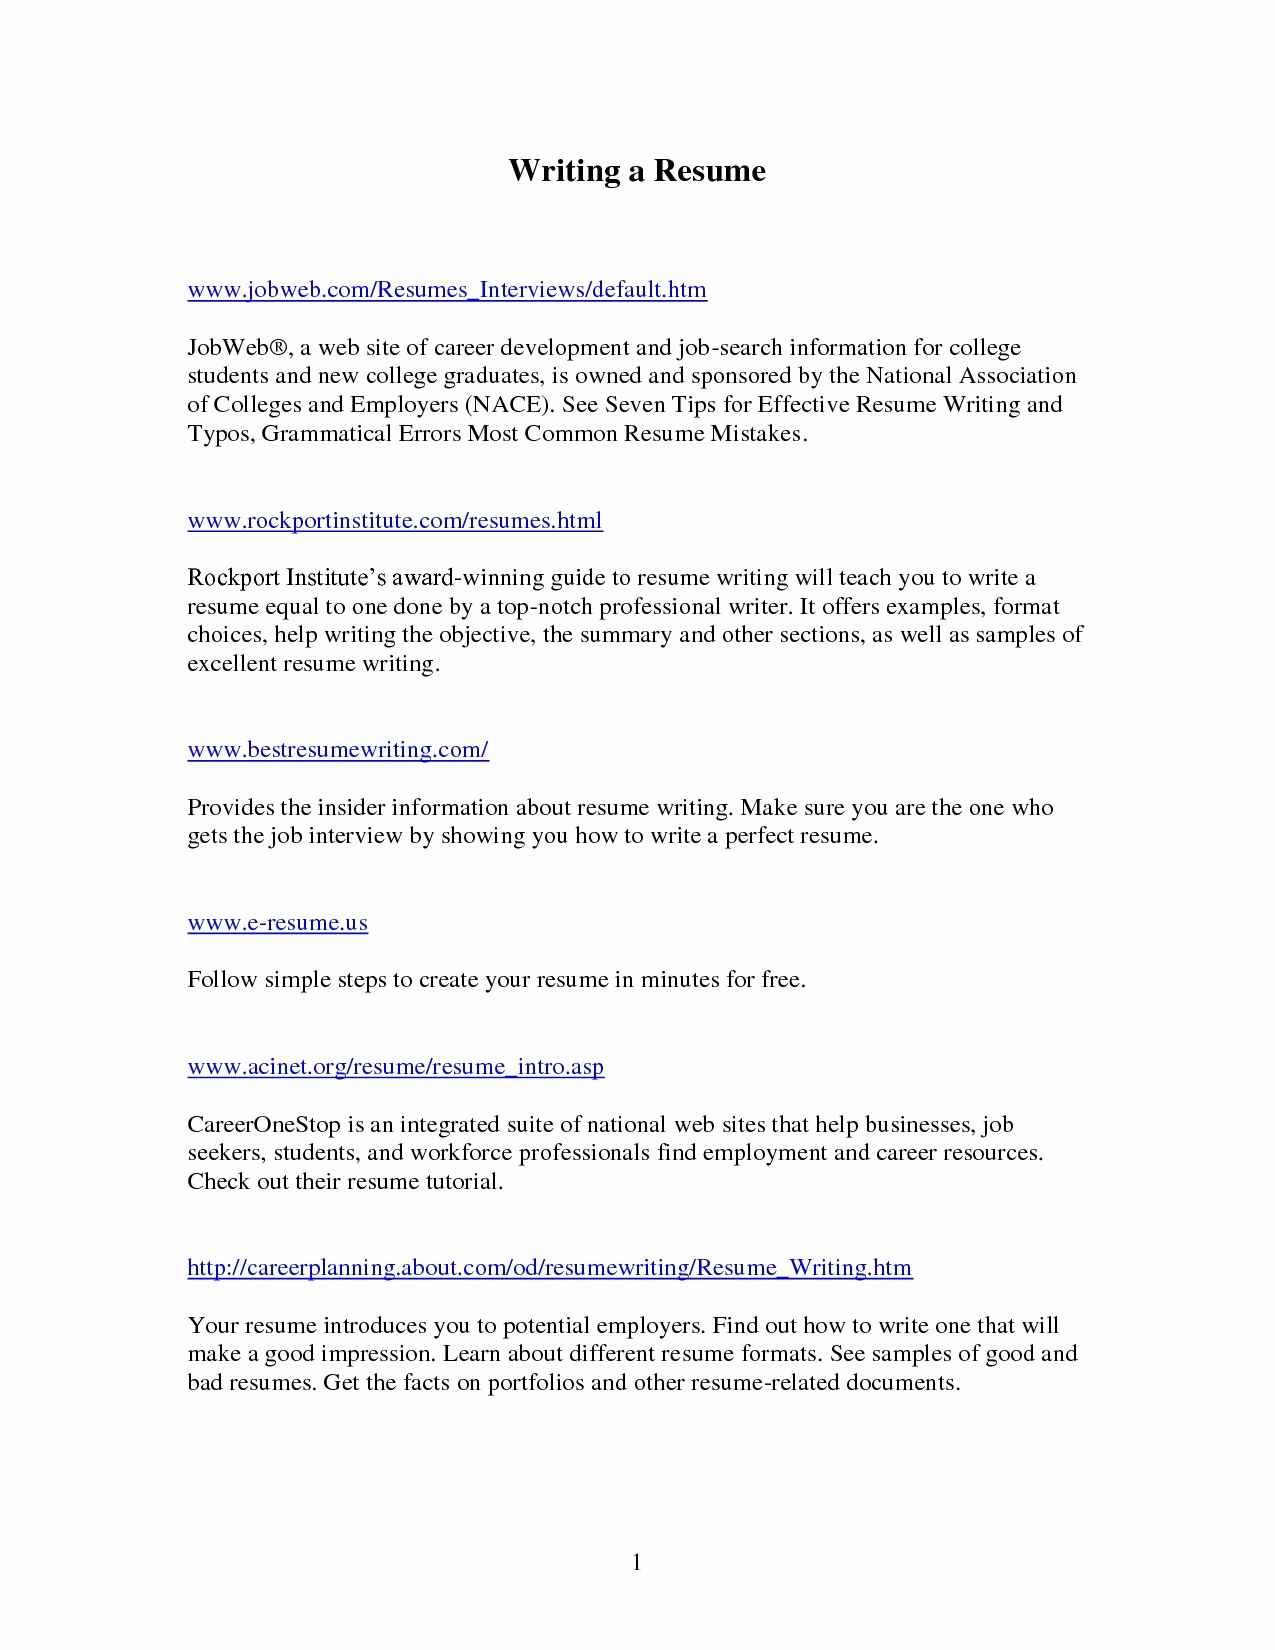 Pretty Free Peion Templates Examples s Retirement Plan